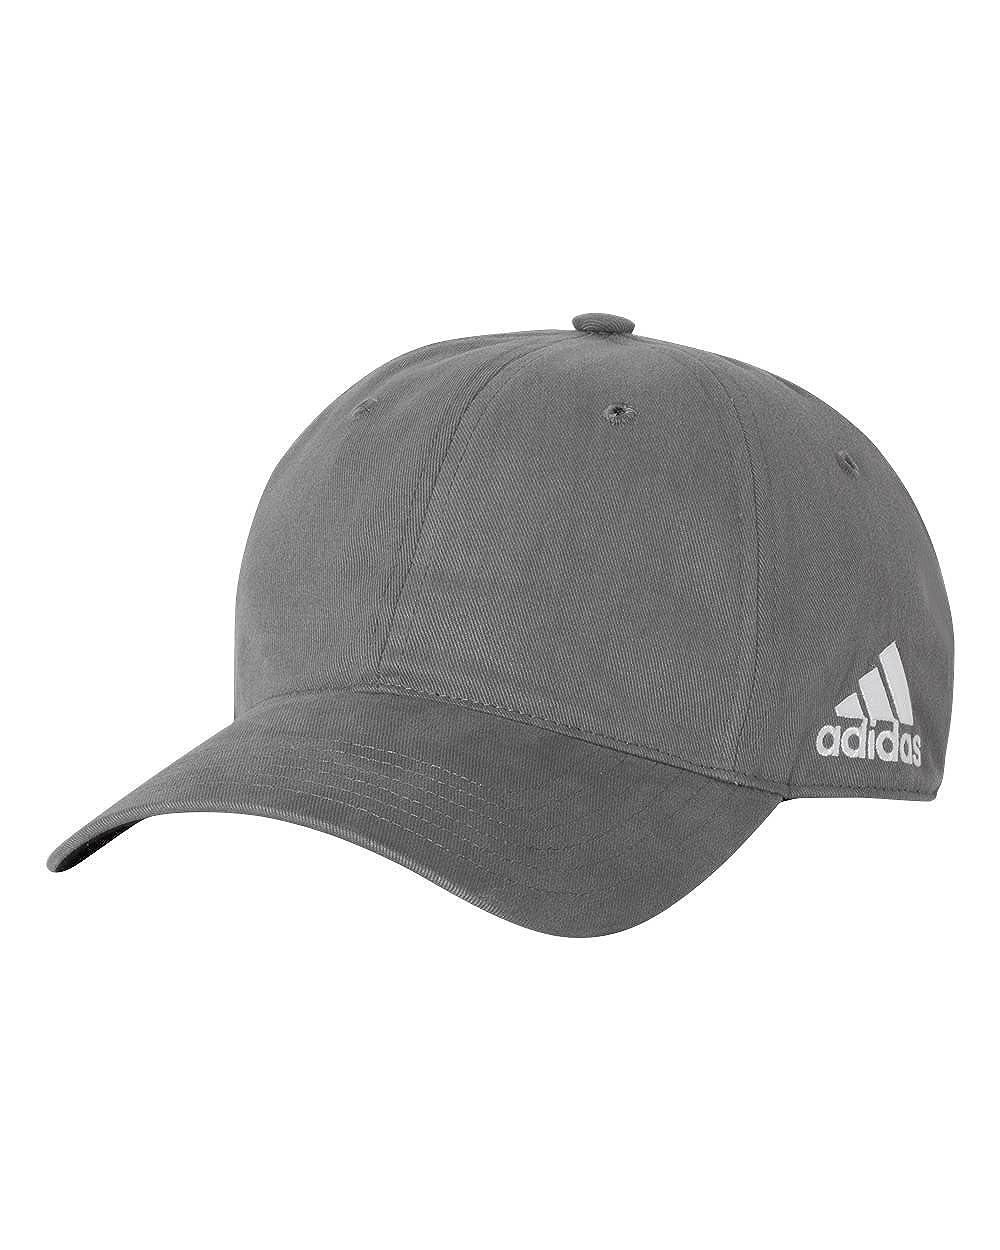 862818d76b1 Amazon.com  adidas Mens Unstructured Cresting Cap (A12) -Black -Adjustable   Sports   Outdoors